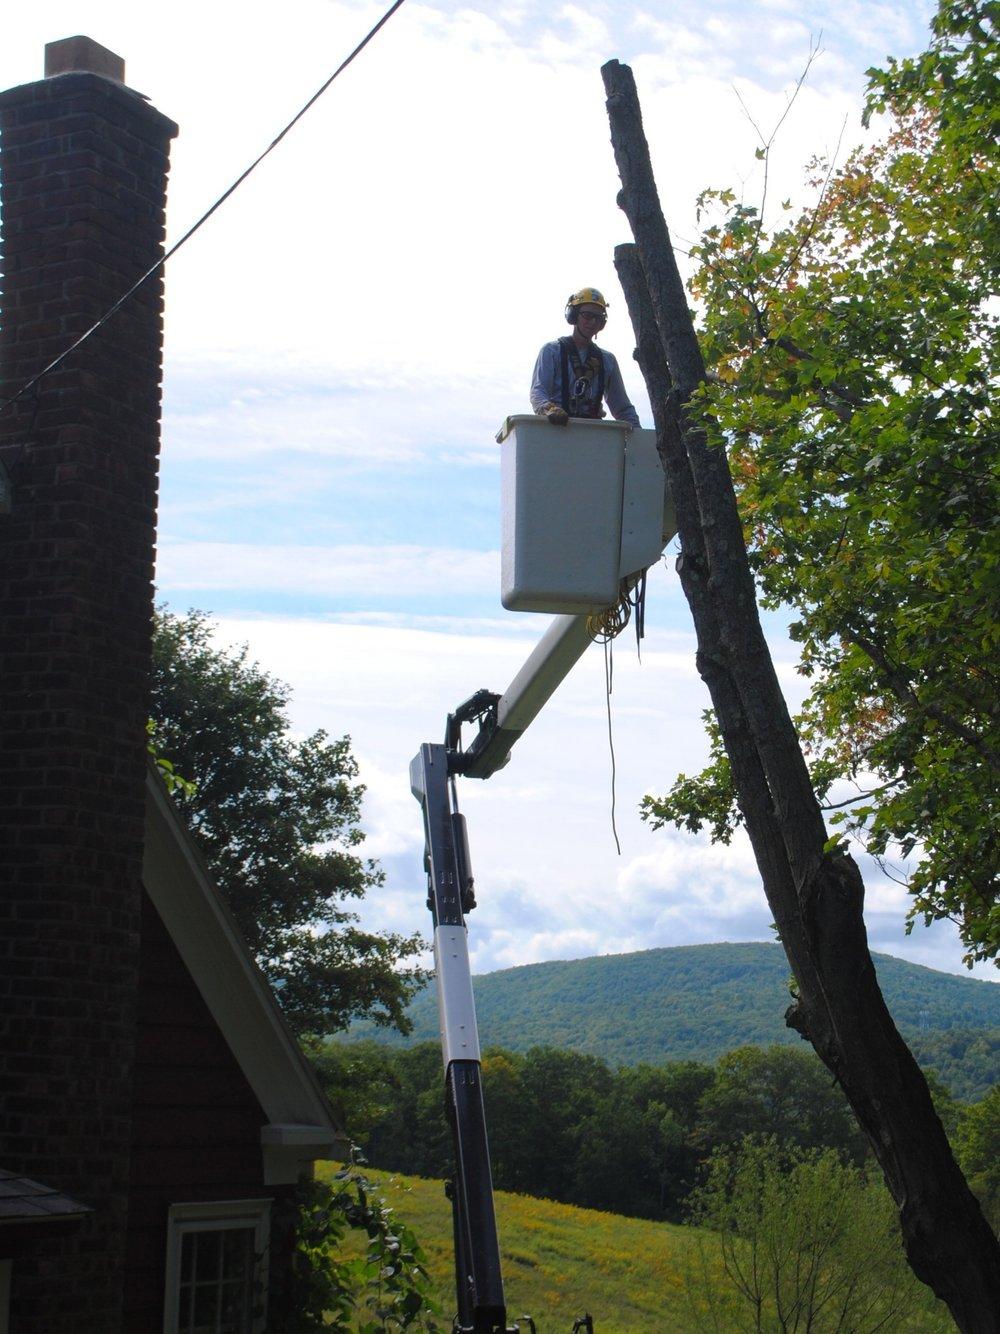 tree-service-testimonial